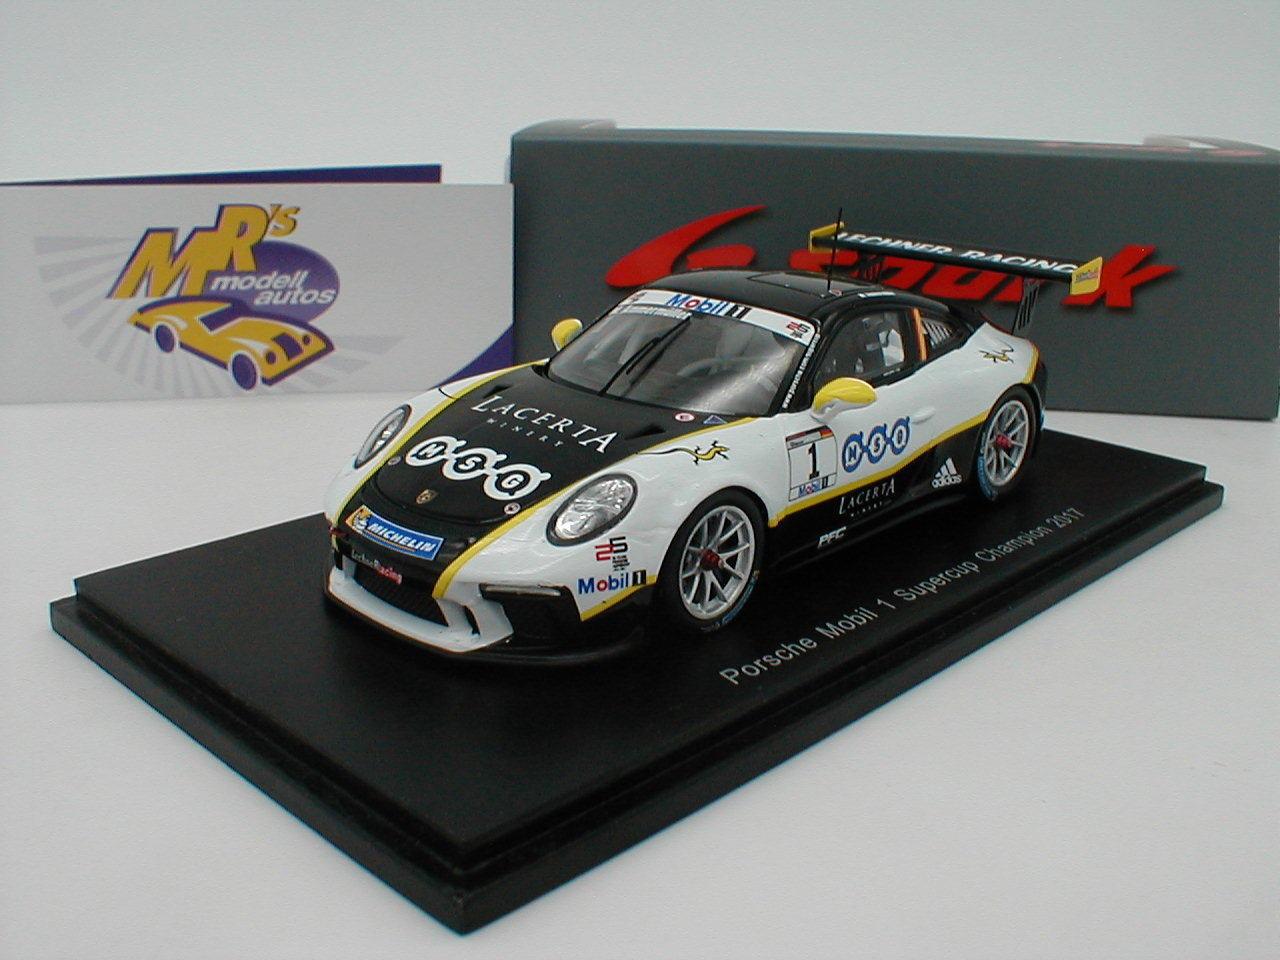 SPARK s5524-Porsche 911 gt3 CUP PORSCHE mobile 1 Supercup Campion 2017 1 43